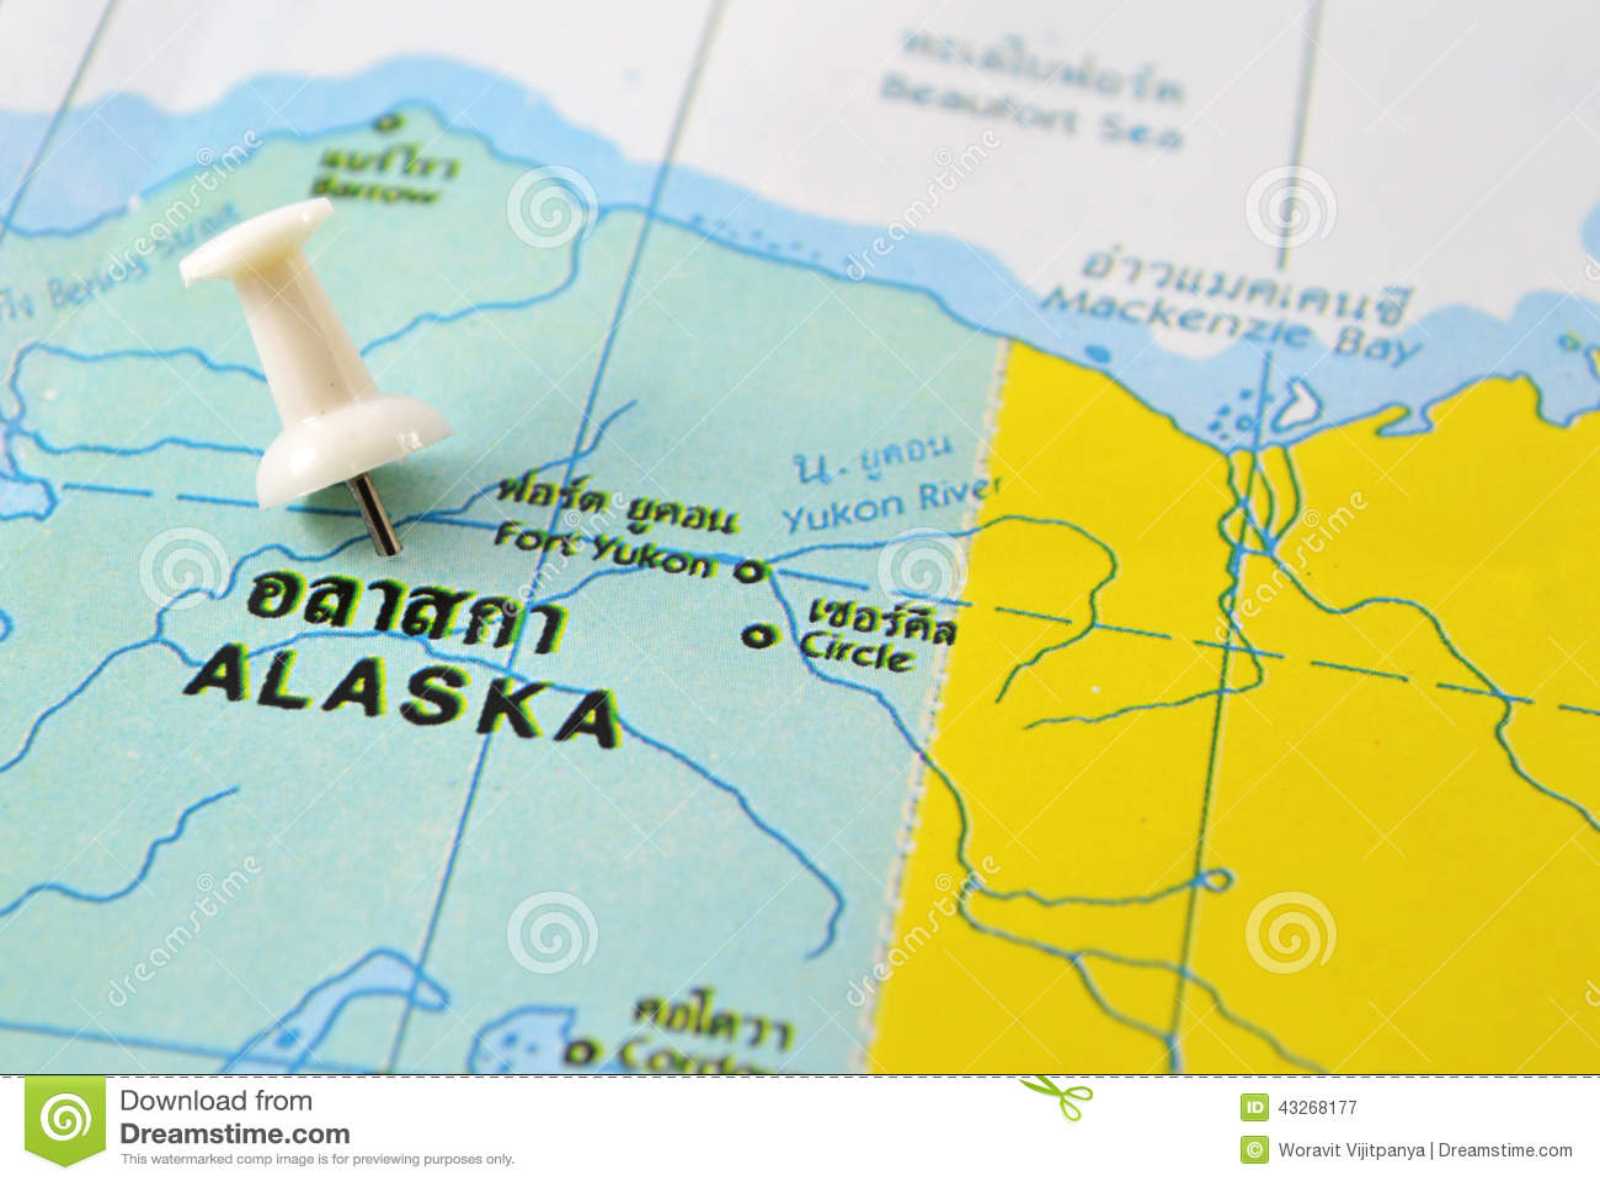 Alaska Map Stock Image Image Of Trip Travel Snow Alaska 43268177